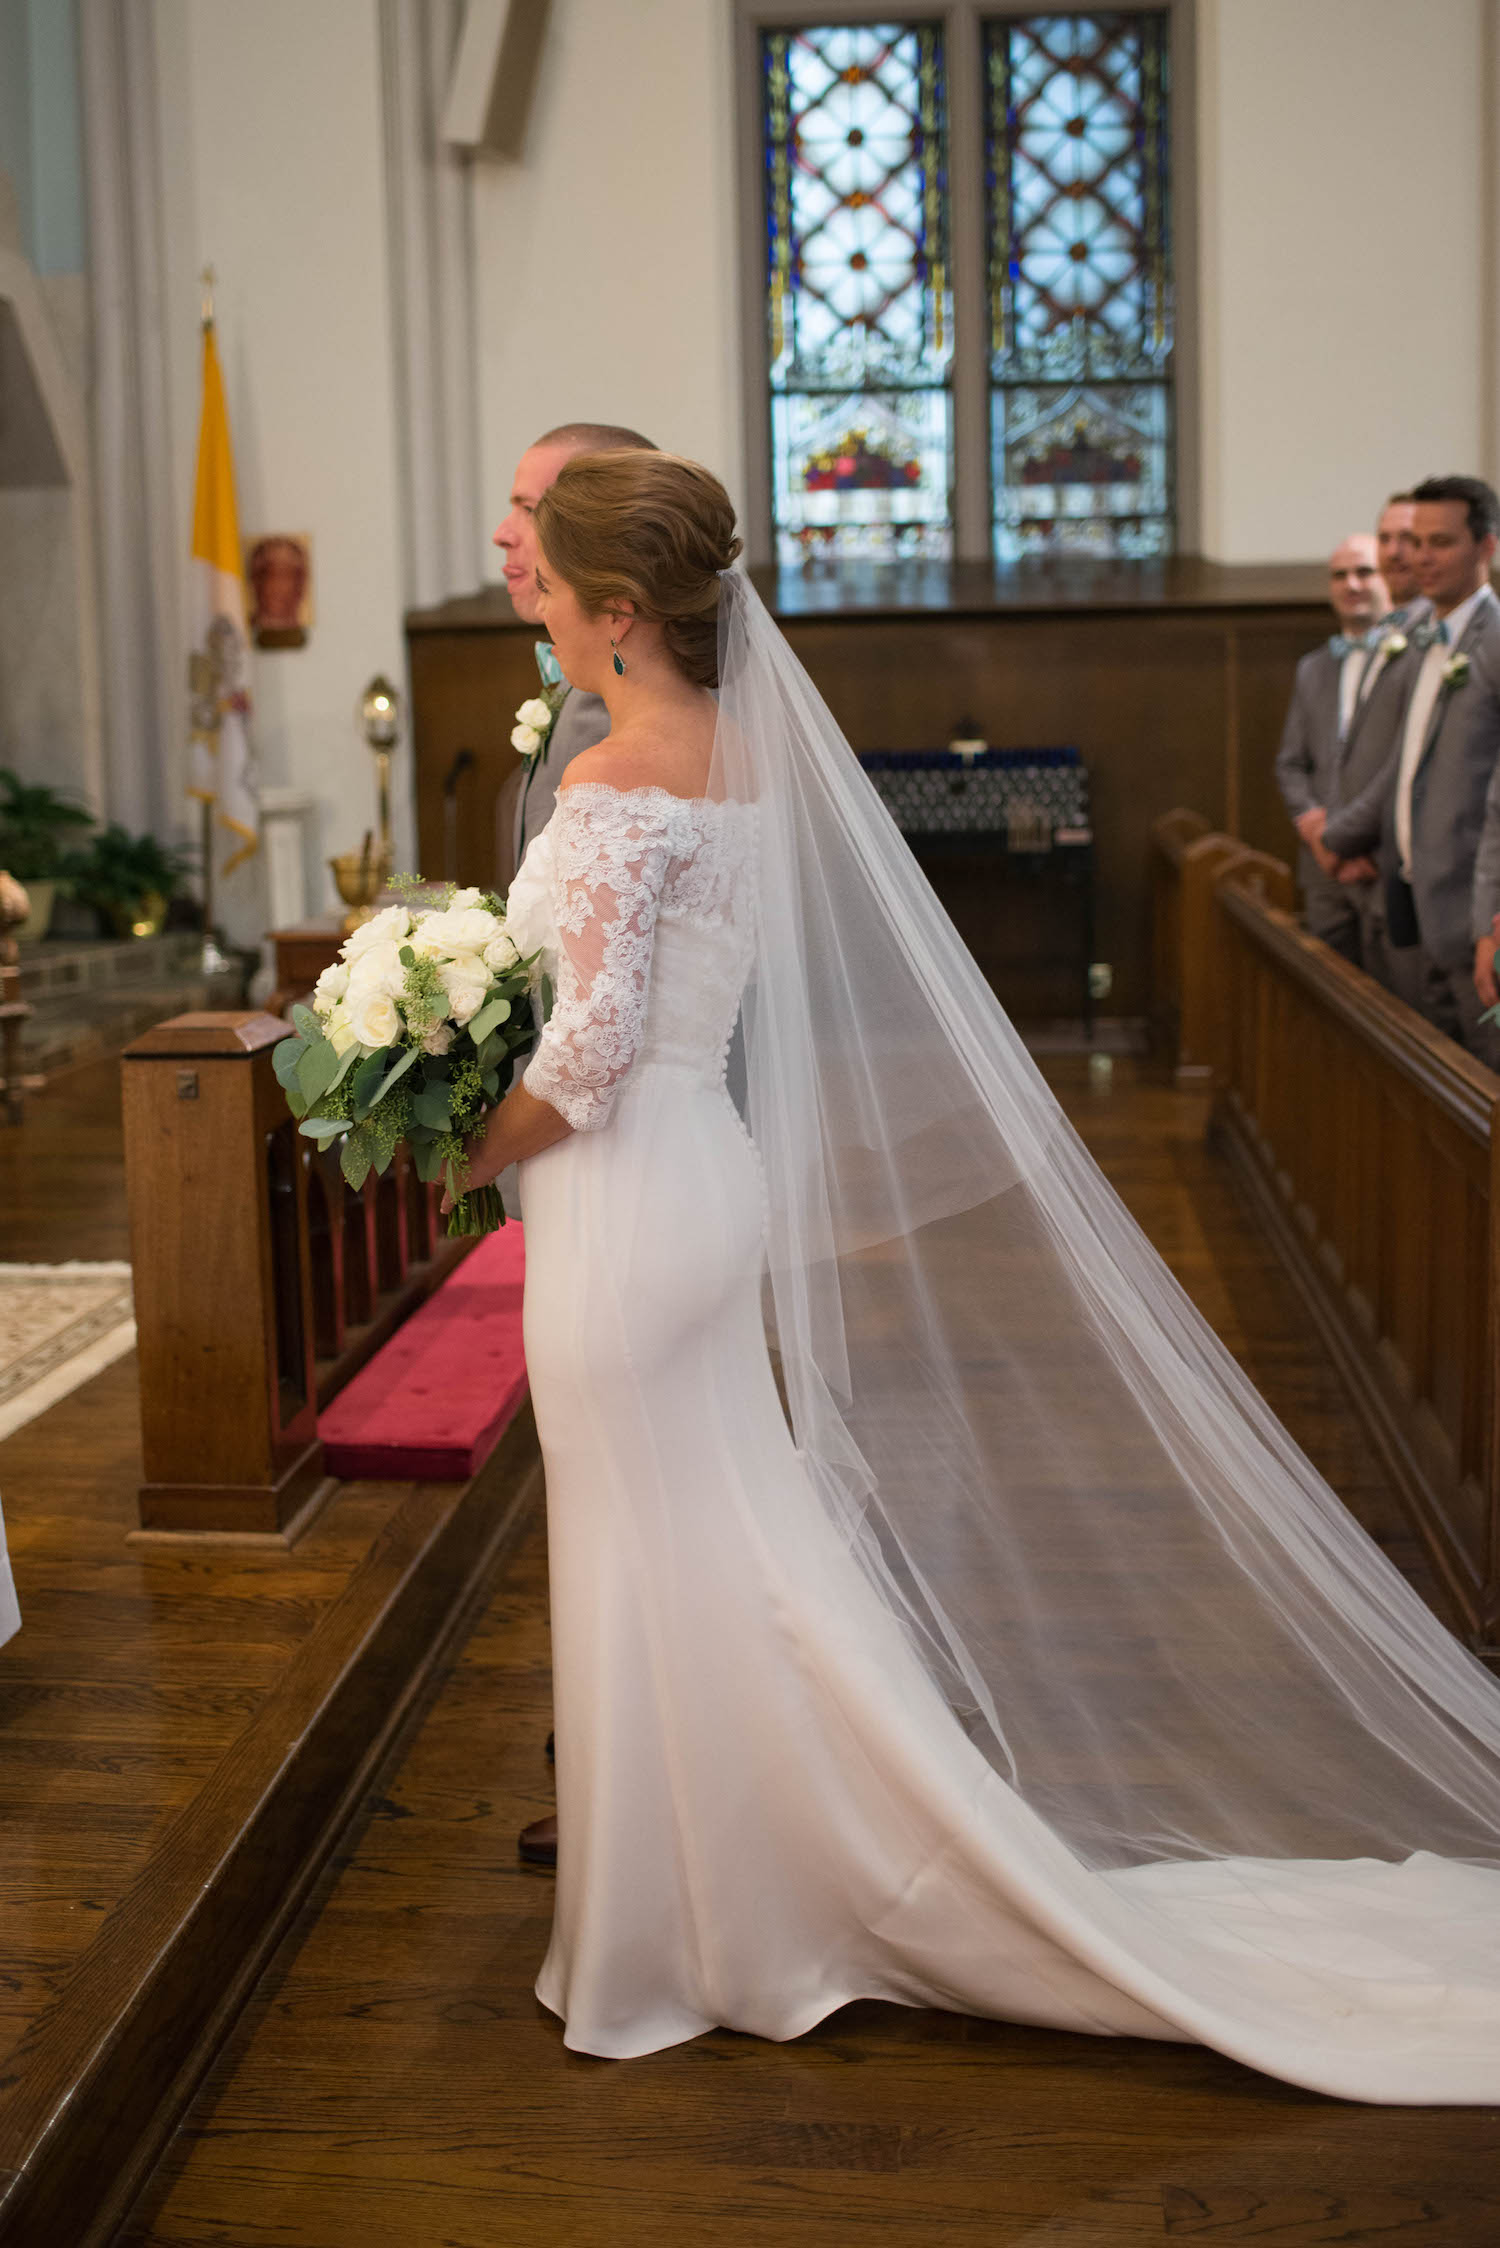 Washington DC Wedding - Sincerely Pete Events - Erin Tetterton Photography - Bride at the Altar